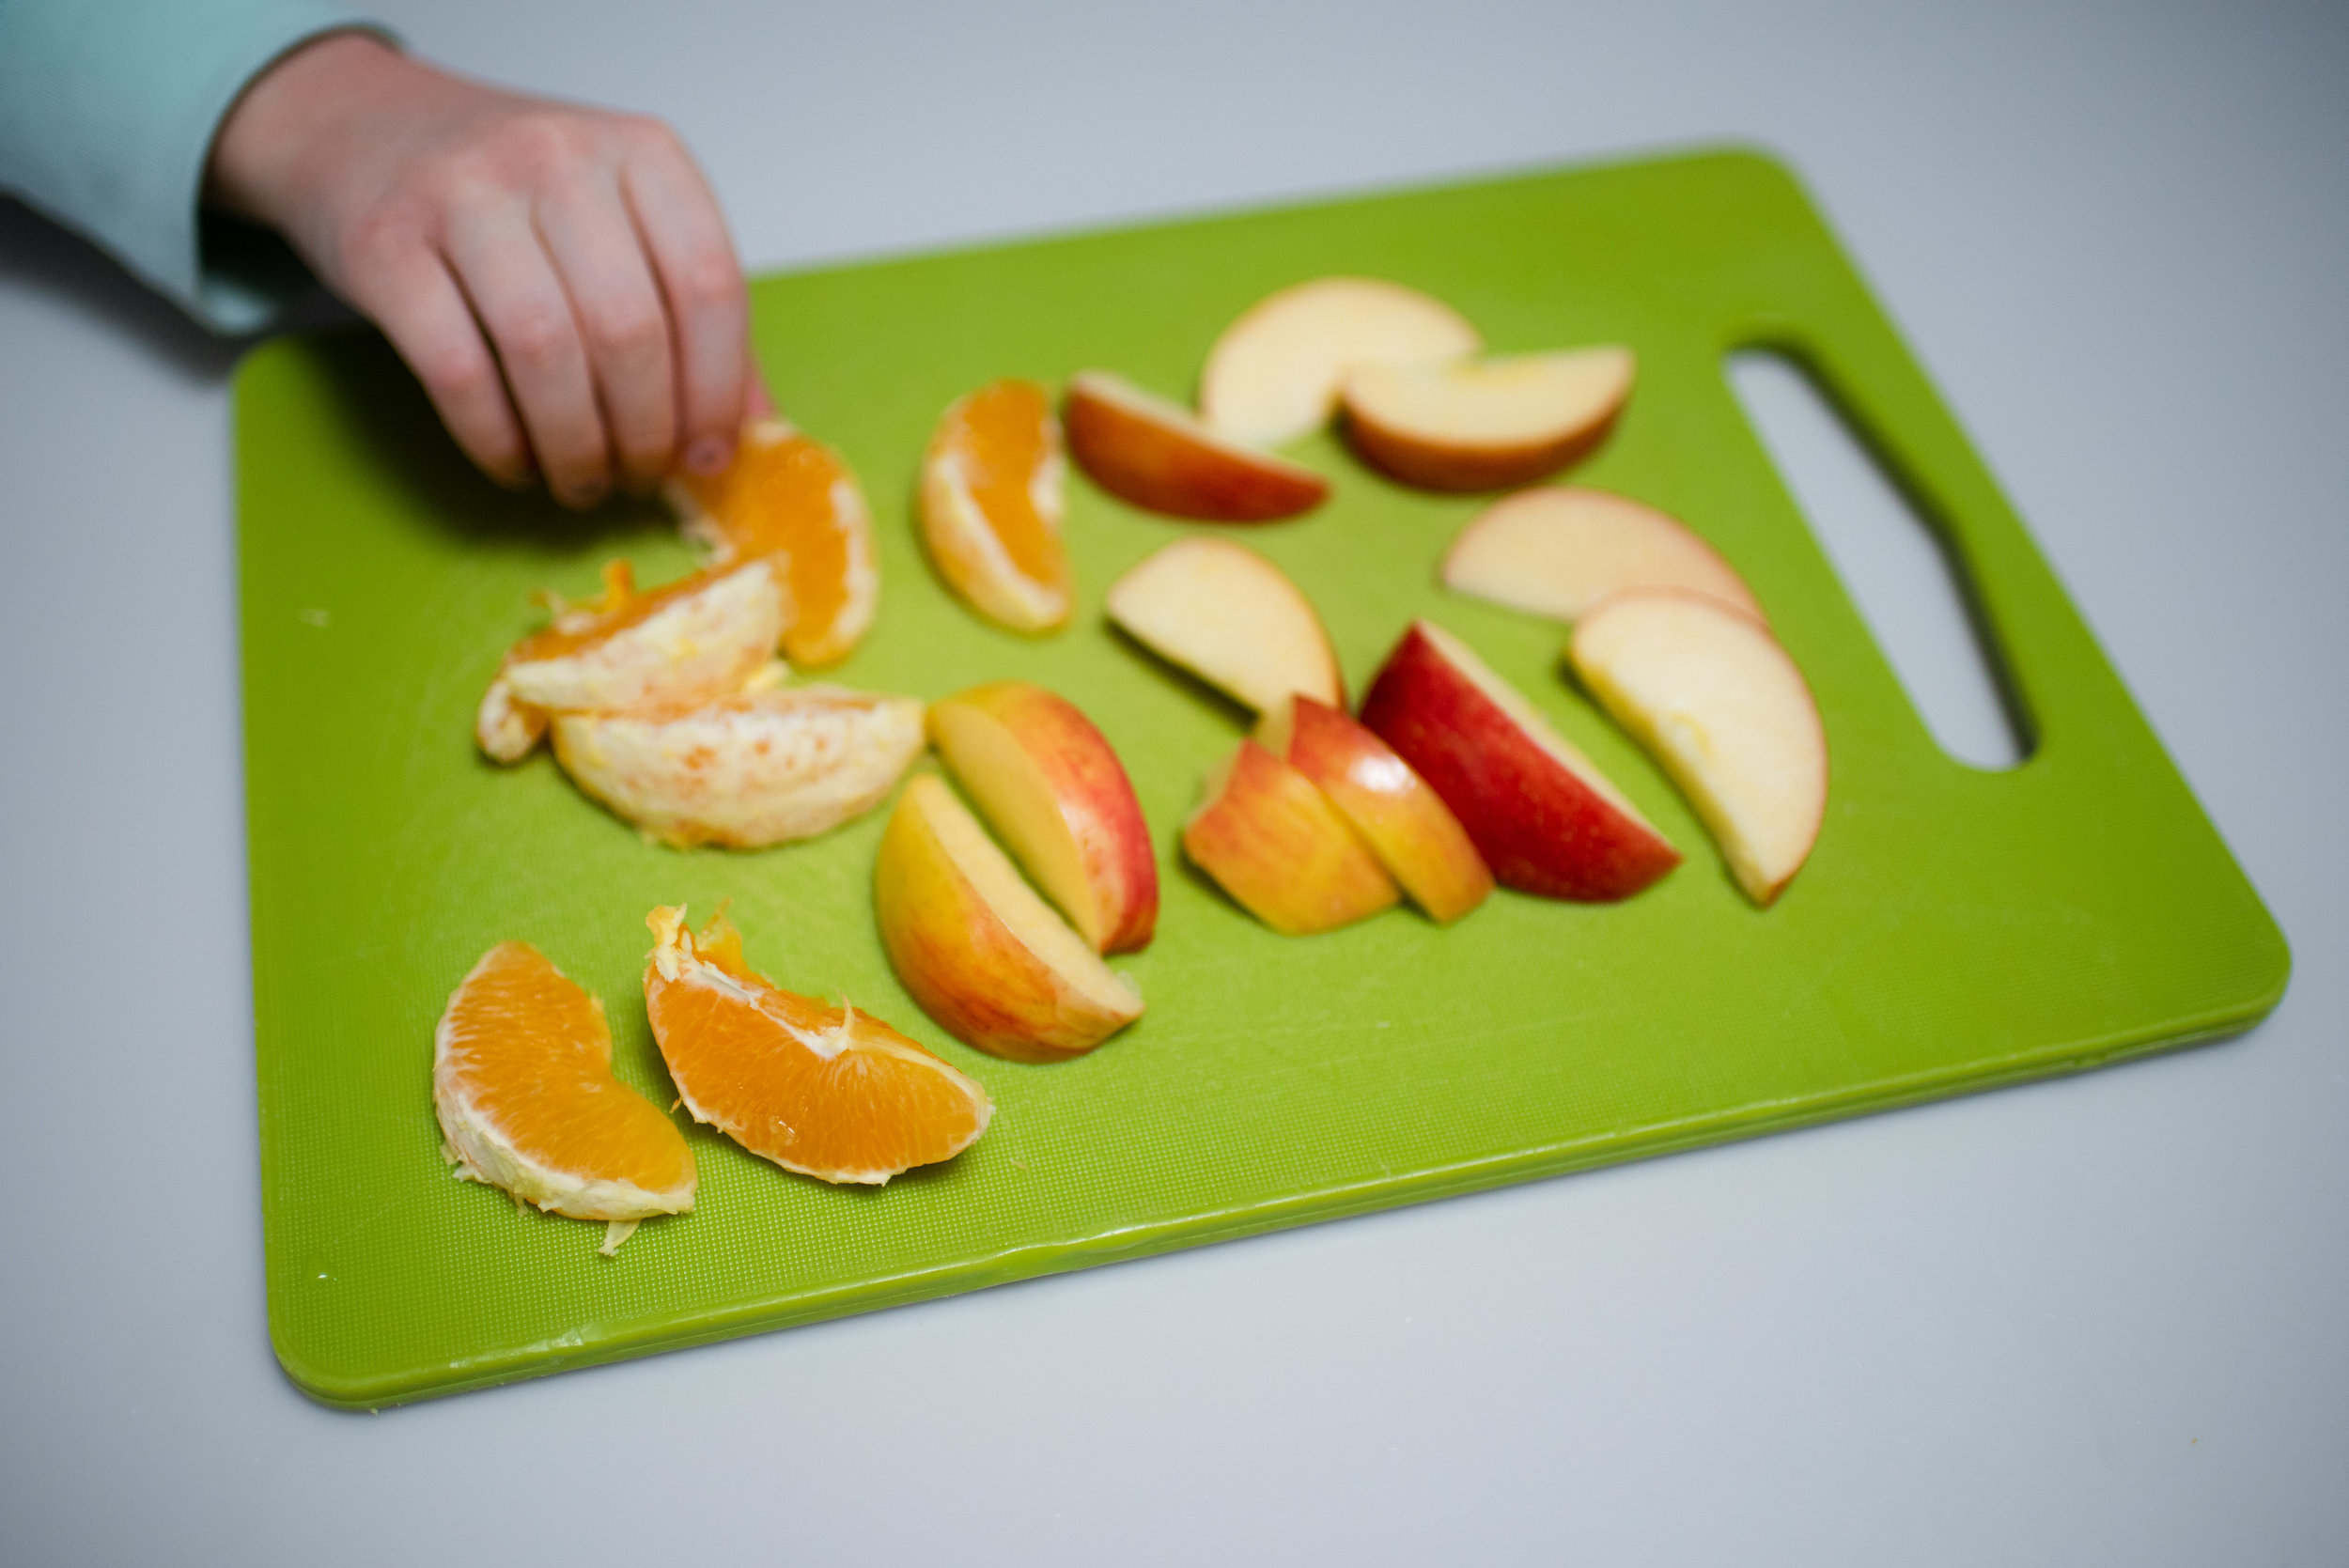 apple and orange sliced on cutting board.jpg